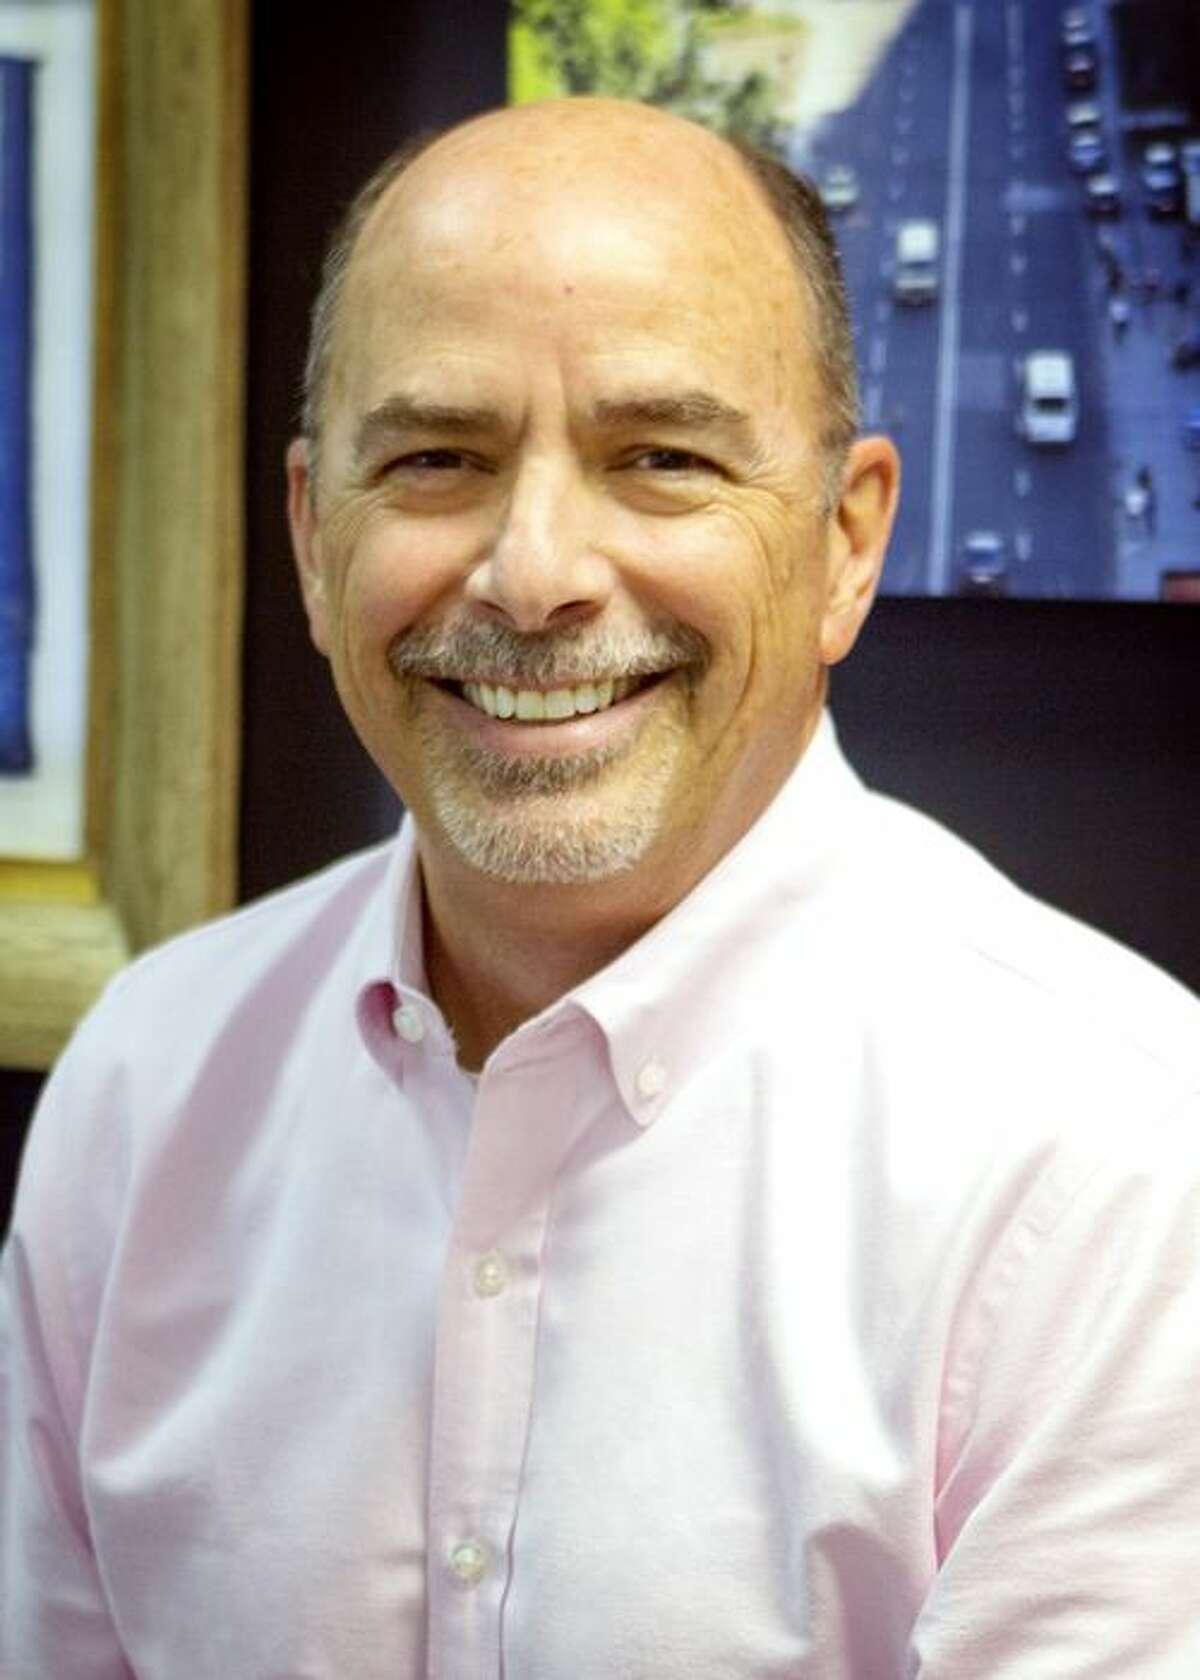 Pastor Doug Lamb